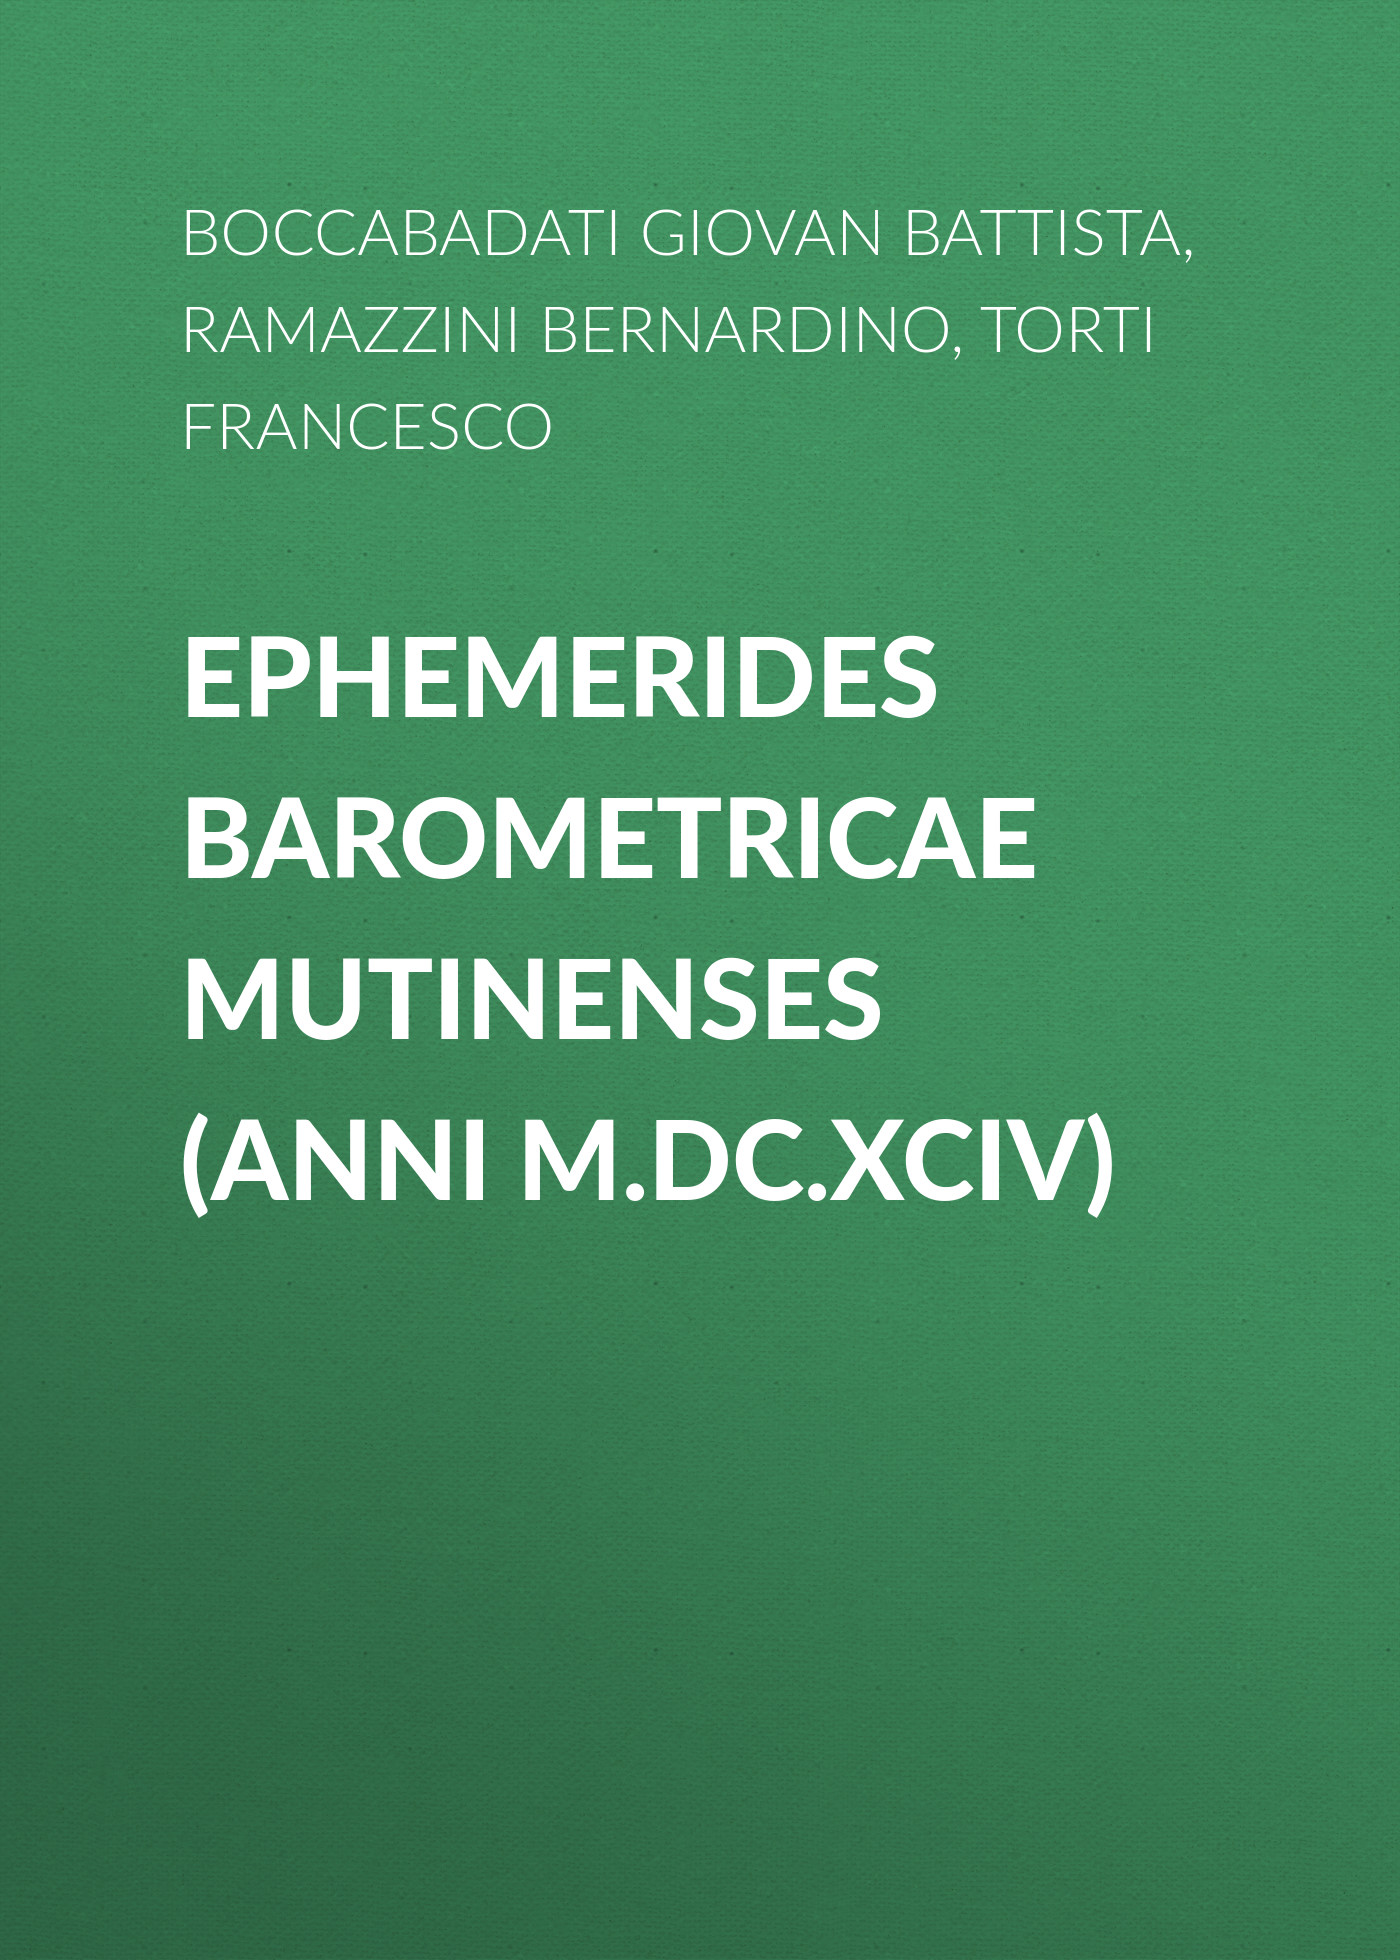 ephemerides barometricae mutinenses anni mdcxciv